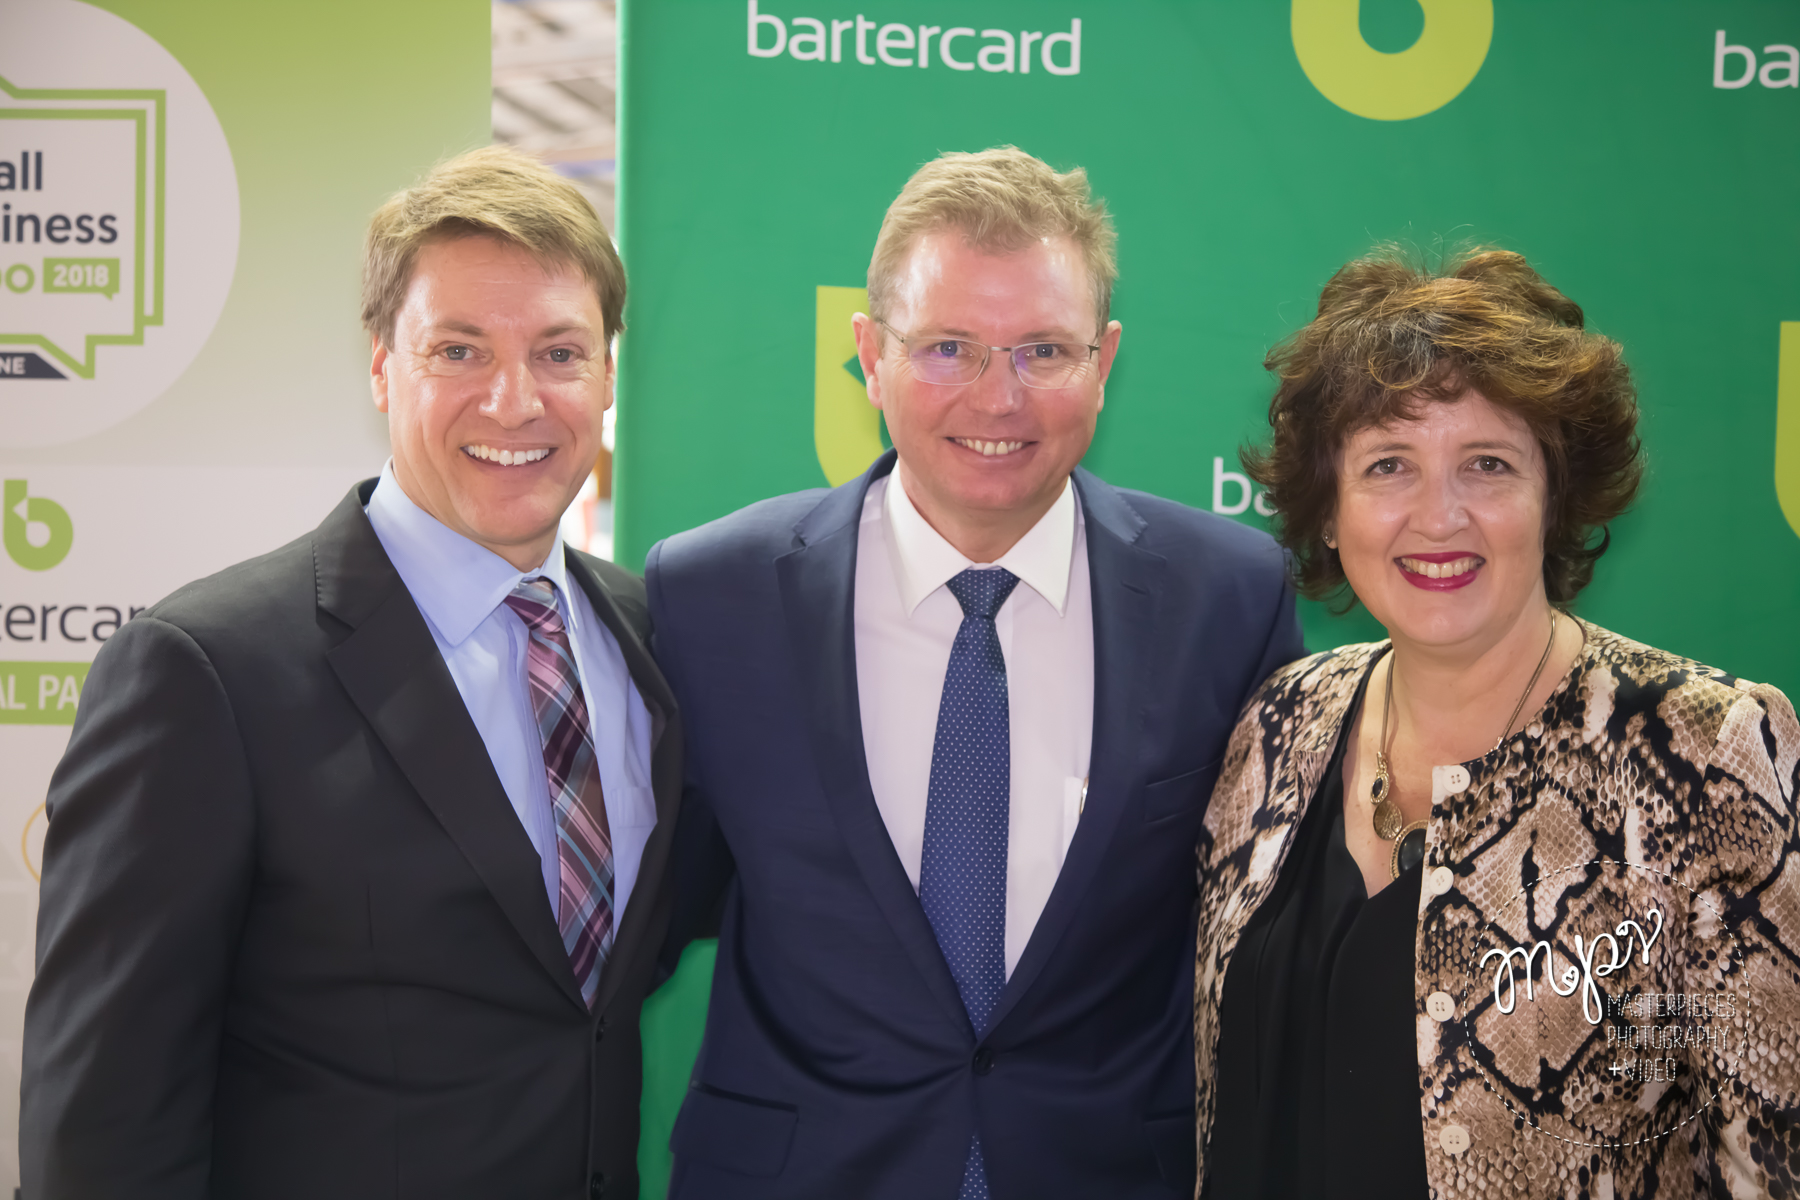 Small Business Expos Bartercard